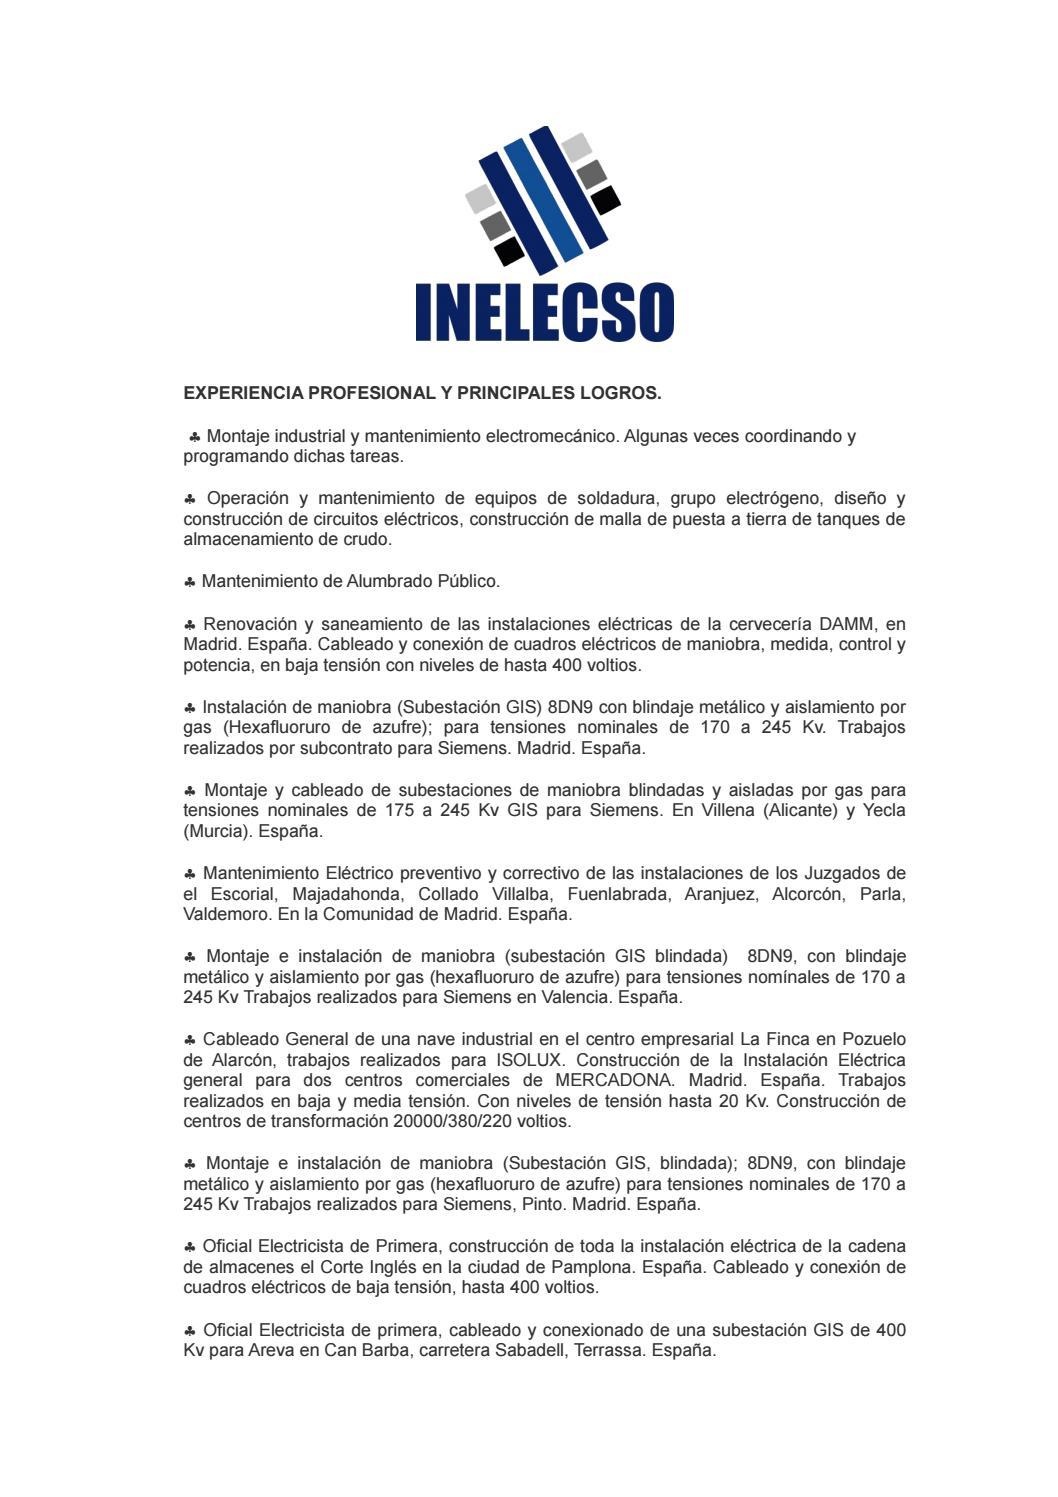 Inelecso Hoja de Vida by Revista Digital - issuu